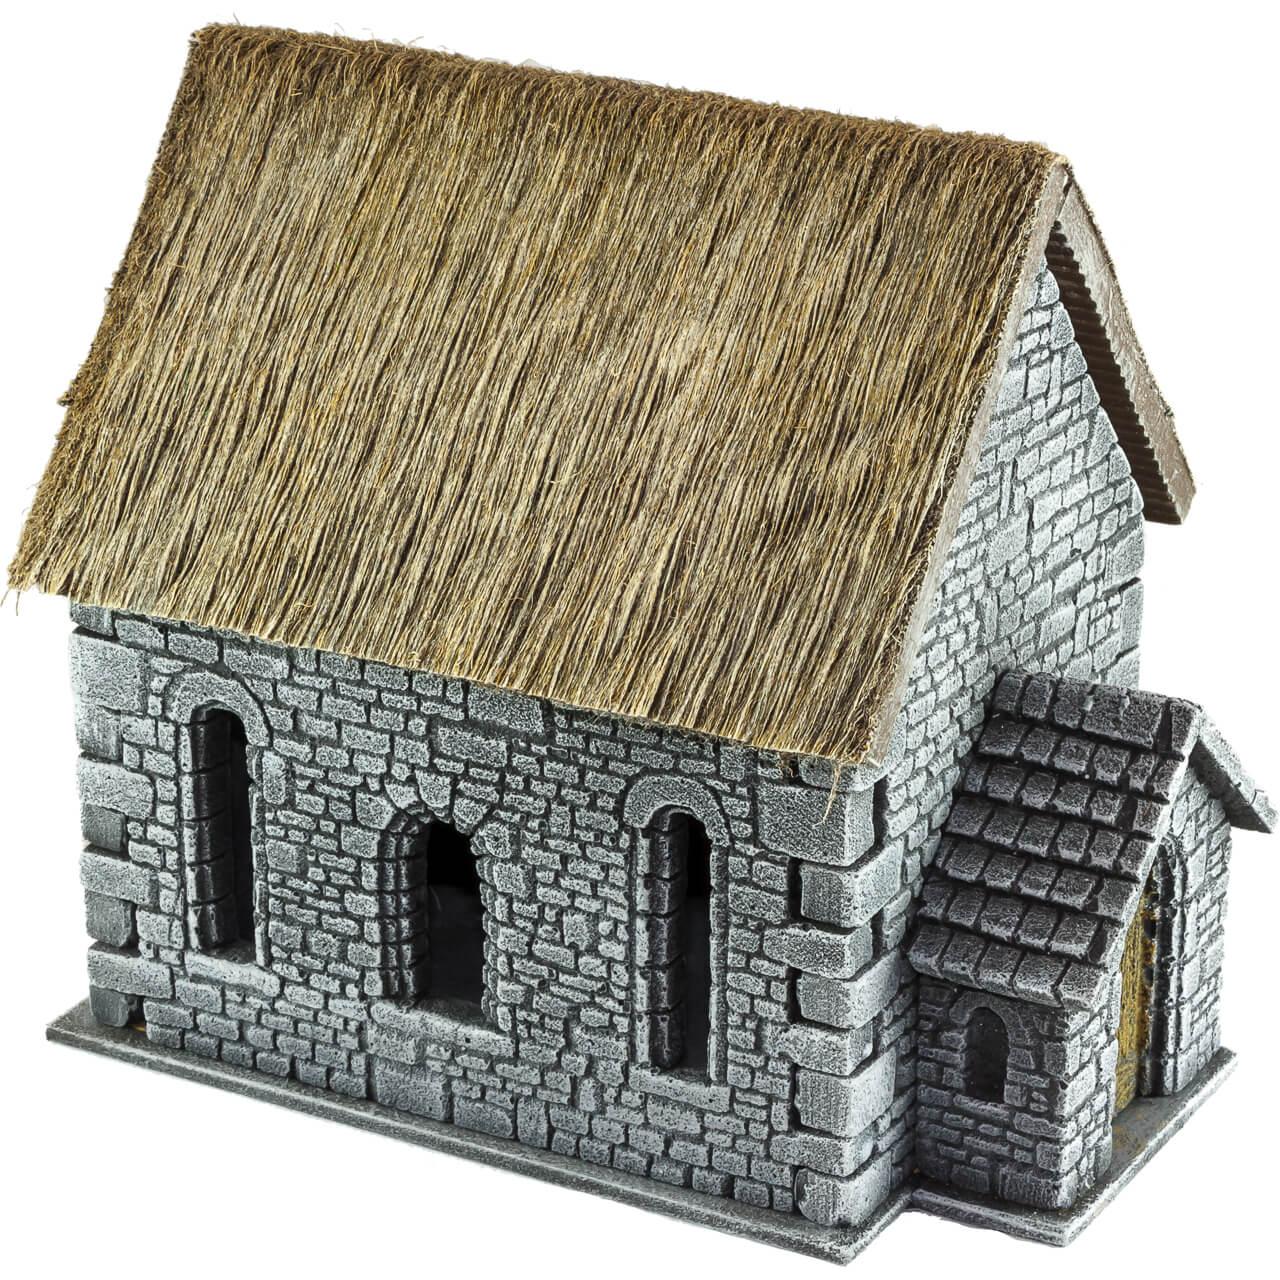 1. Produktabbildung - Mittelalterliche Kapelle